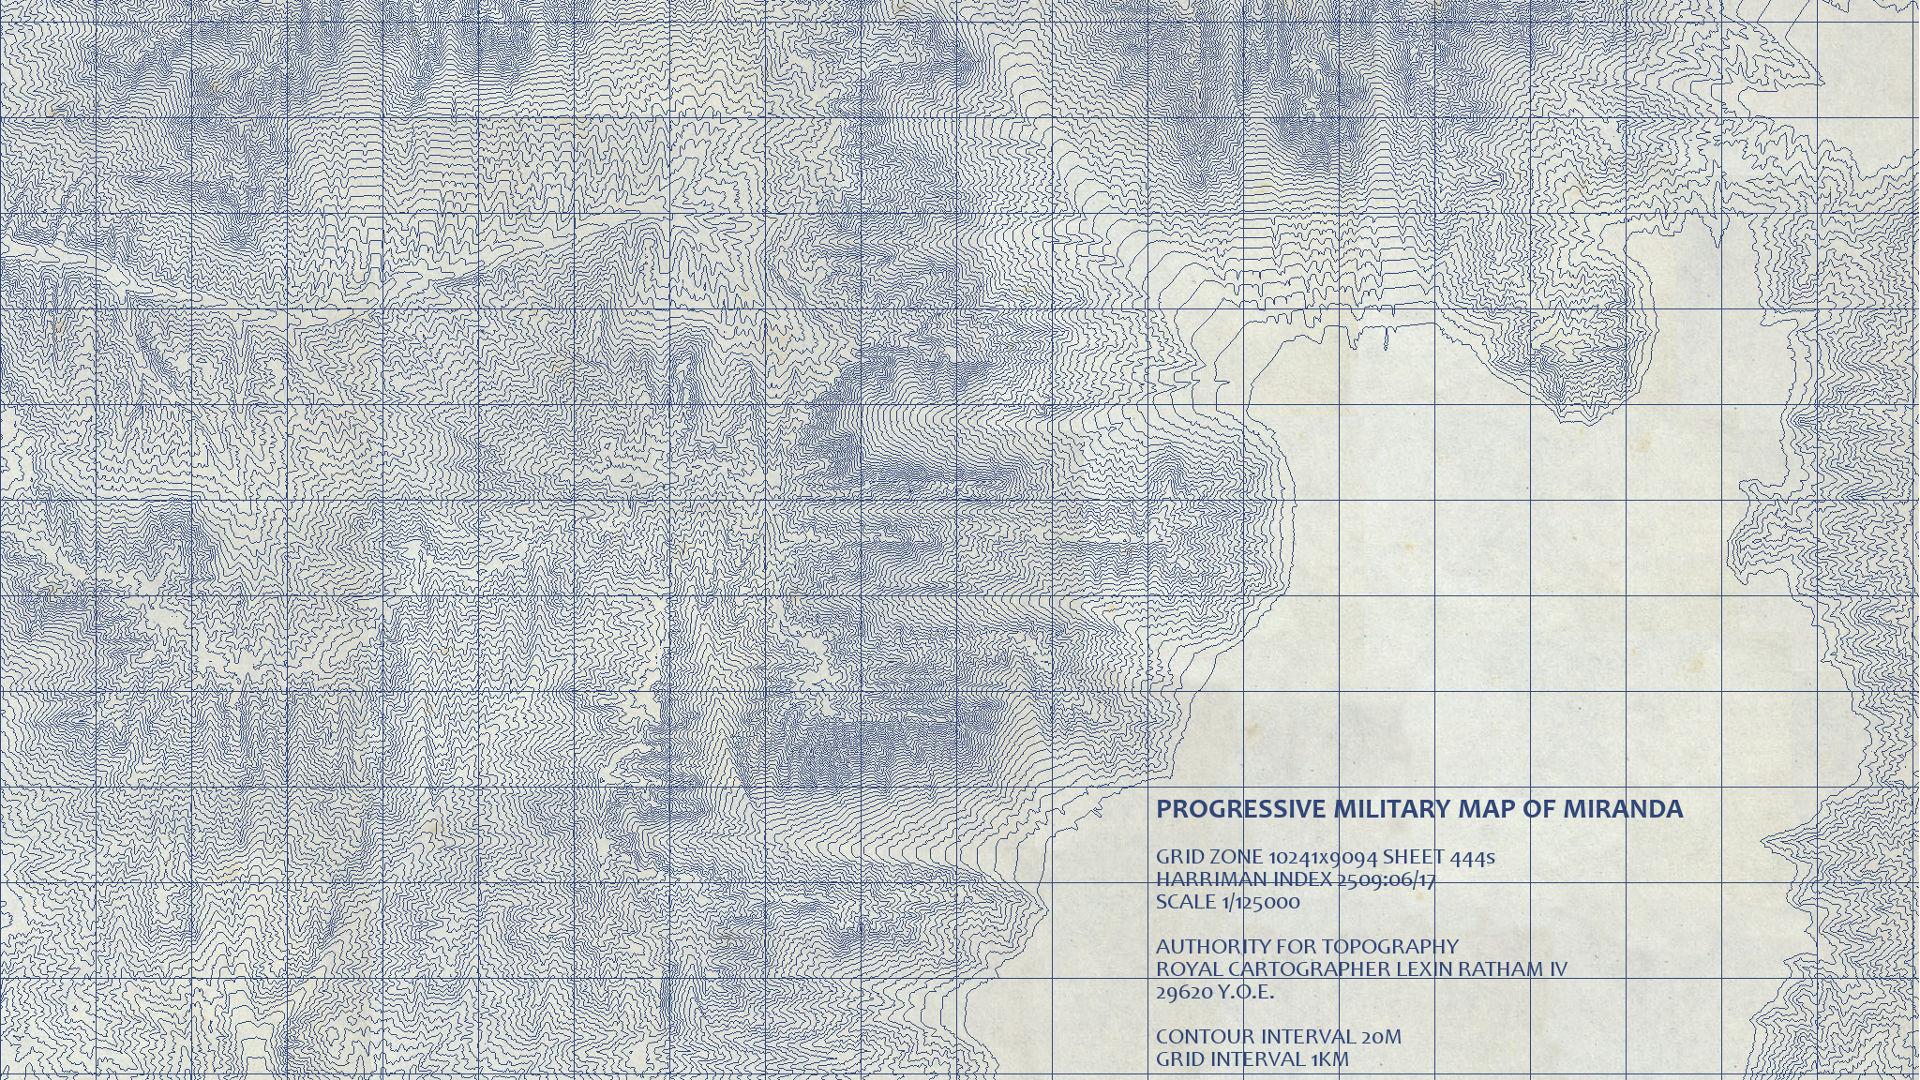 Progressive Military Map of Miranda